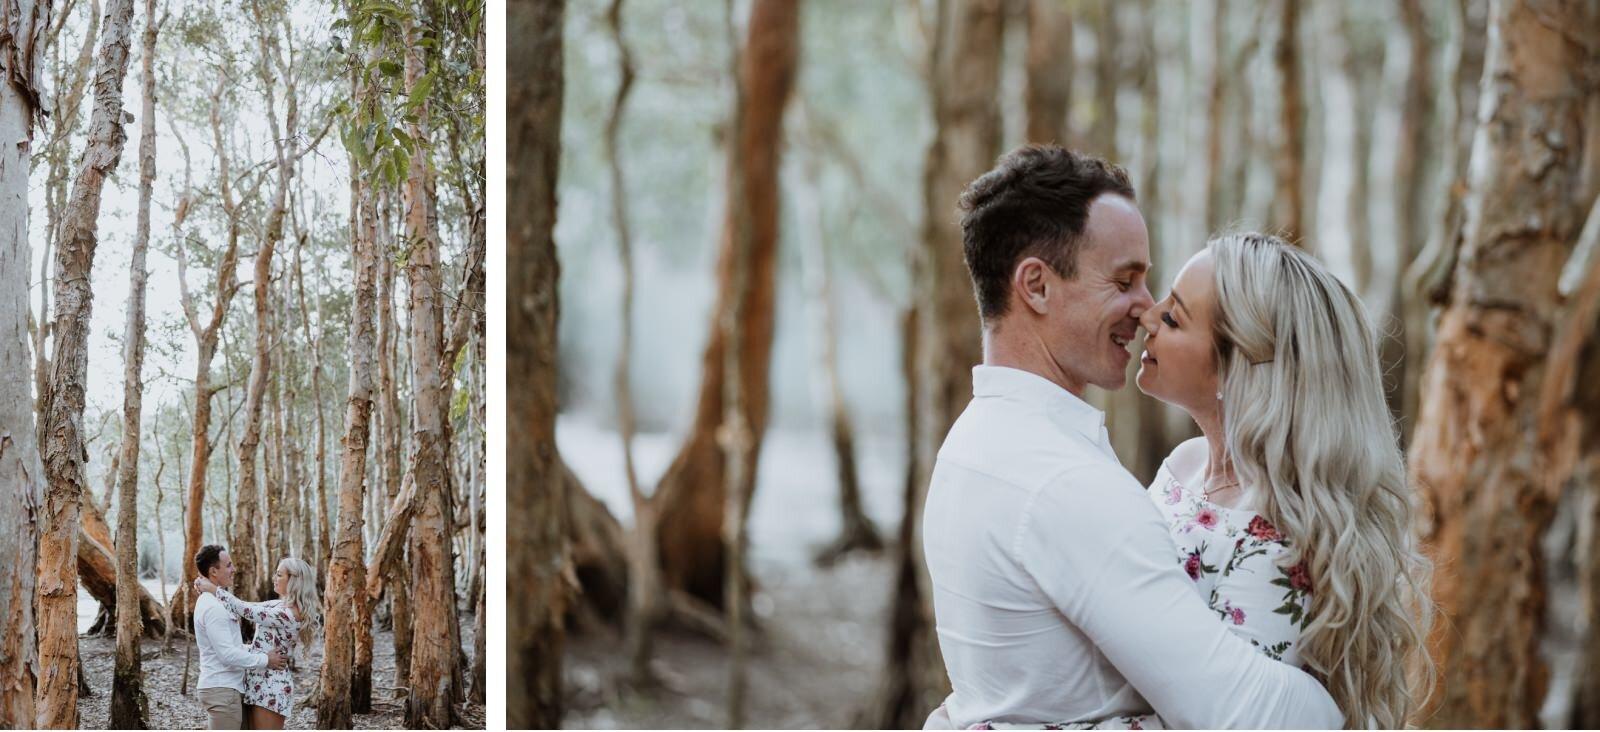 newcastle-wedding-photographer-dudley-engagement-shoot-3.jpg